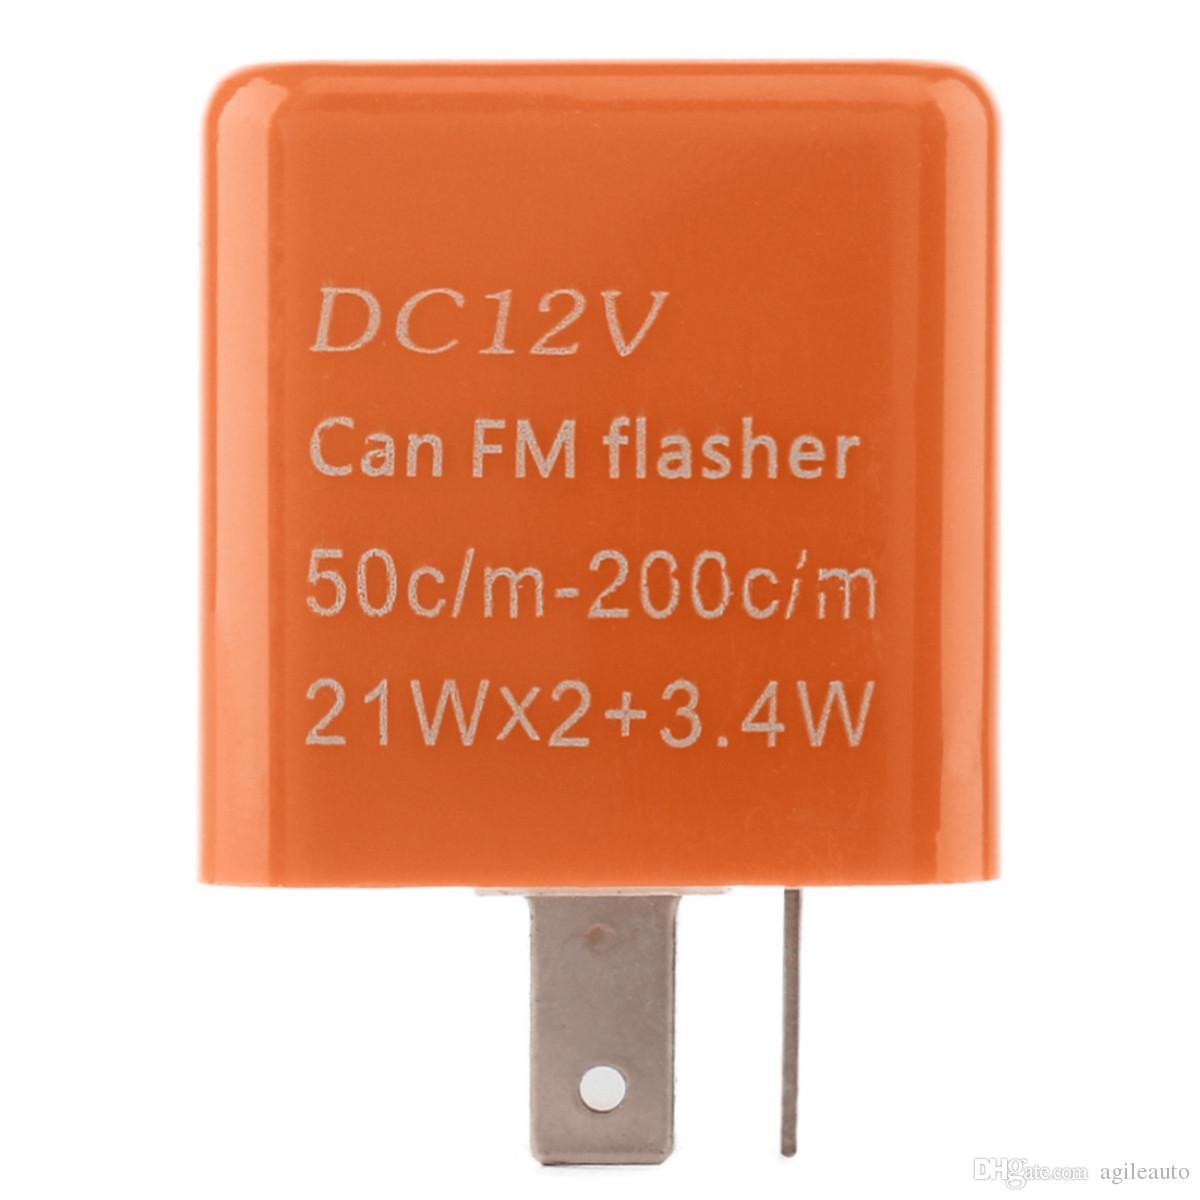 2 Pin 50C / m-200C / m Moto Einstellbare Frequenz LED Blinkrelais Motorrad Blinker Licht Blinker Anzeige Widerstand MOT_50Y